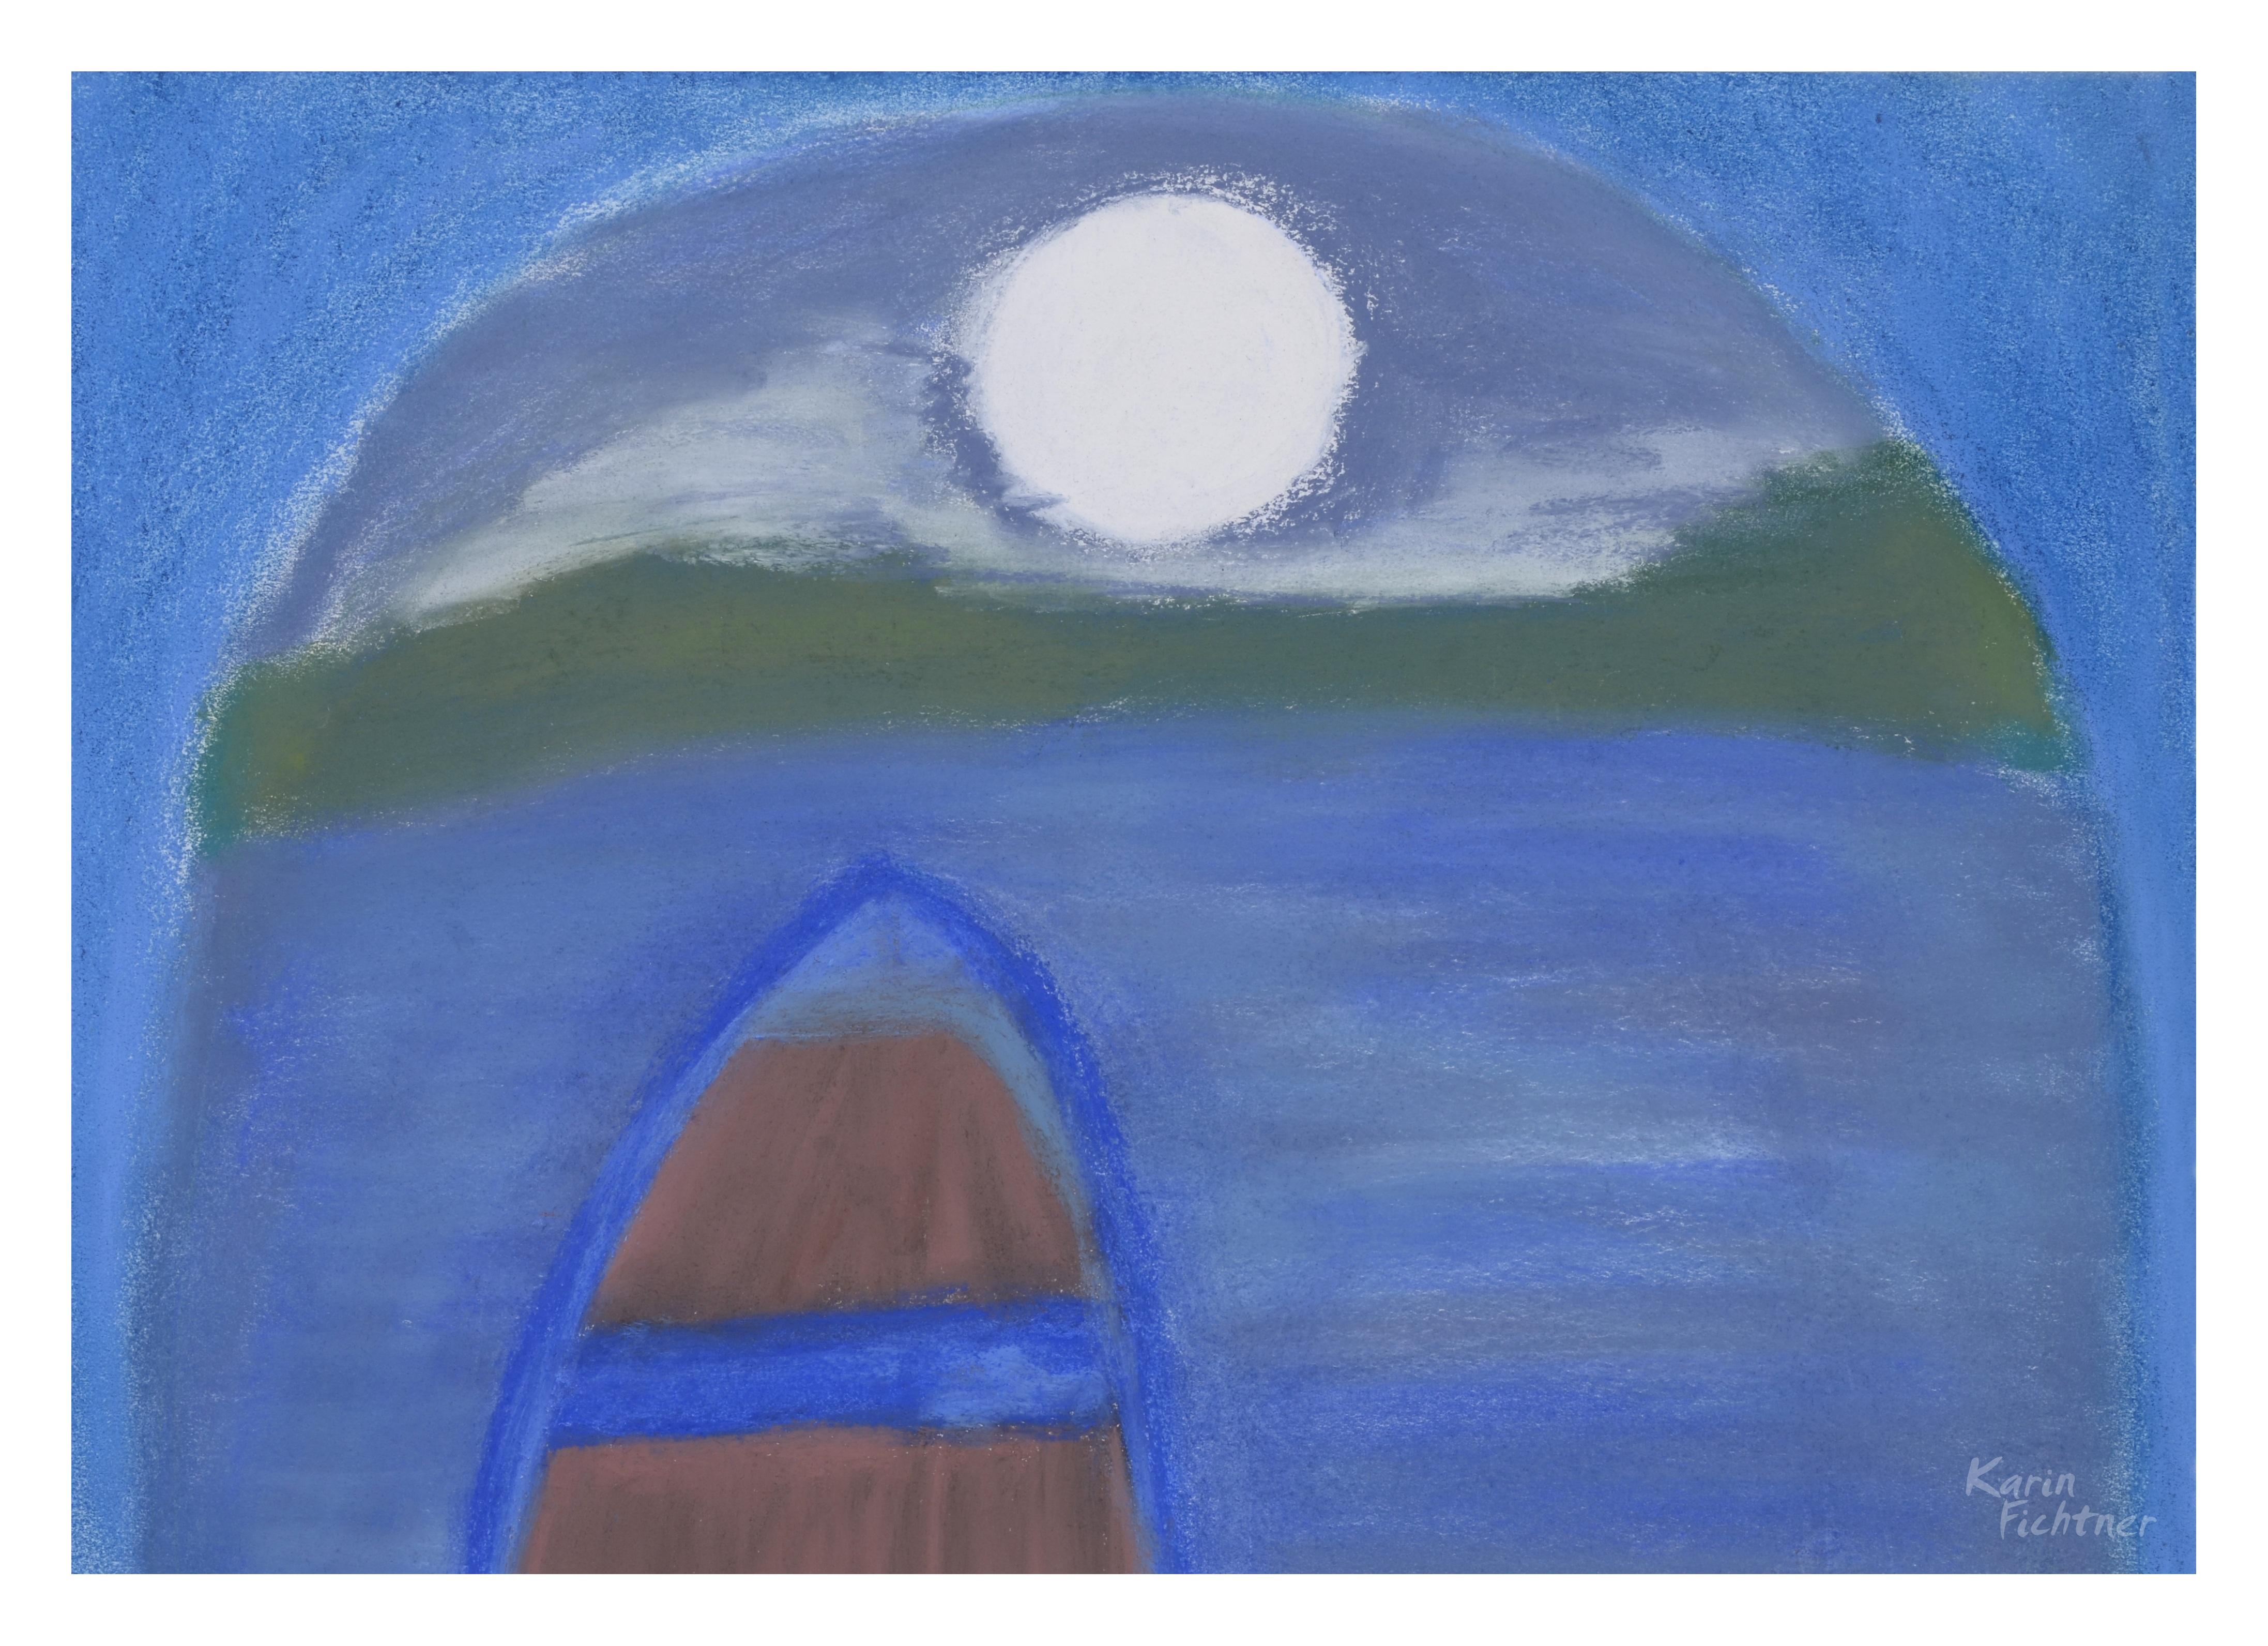 Fotoğraf Su Gece Göl Tasavvufi çizme Sörf Tahtası Mavi